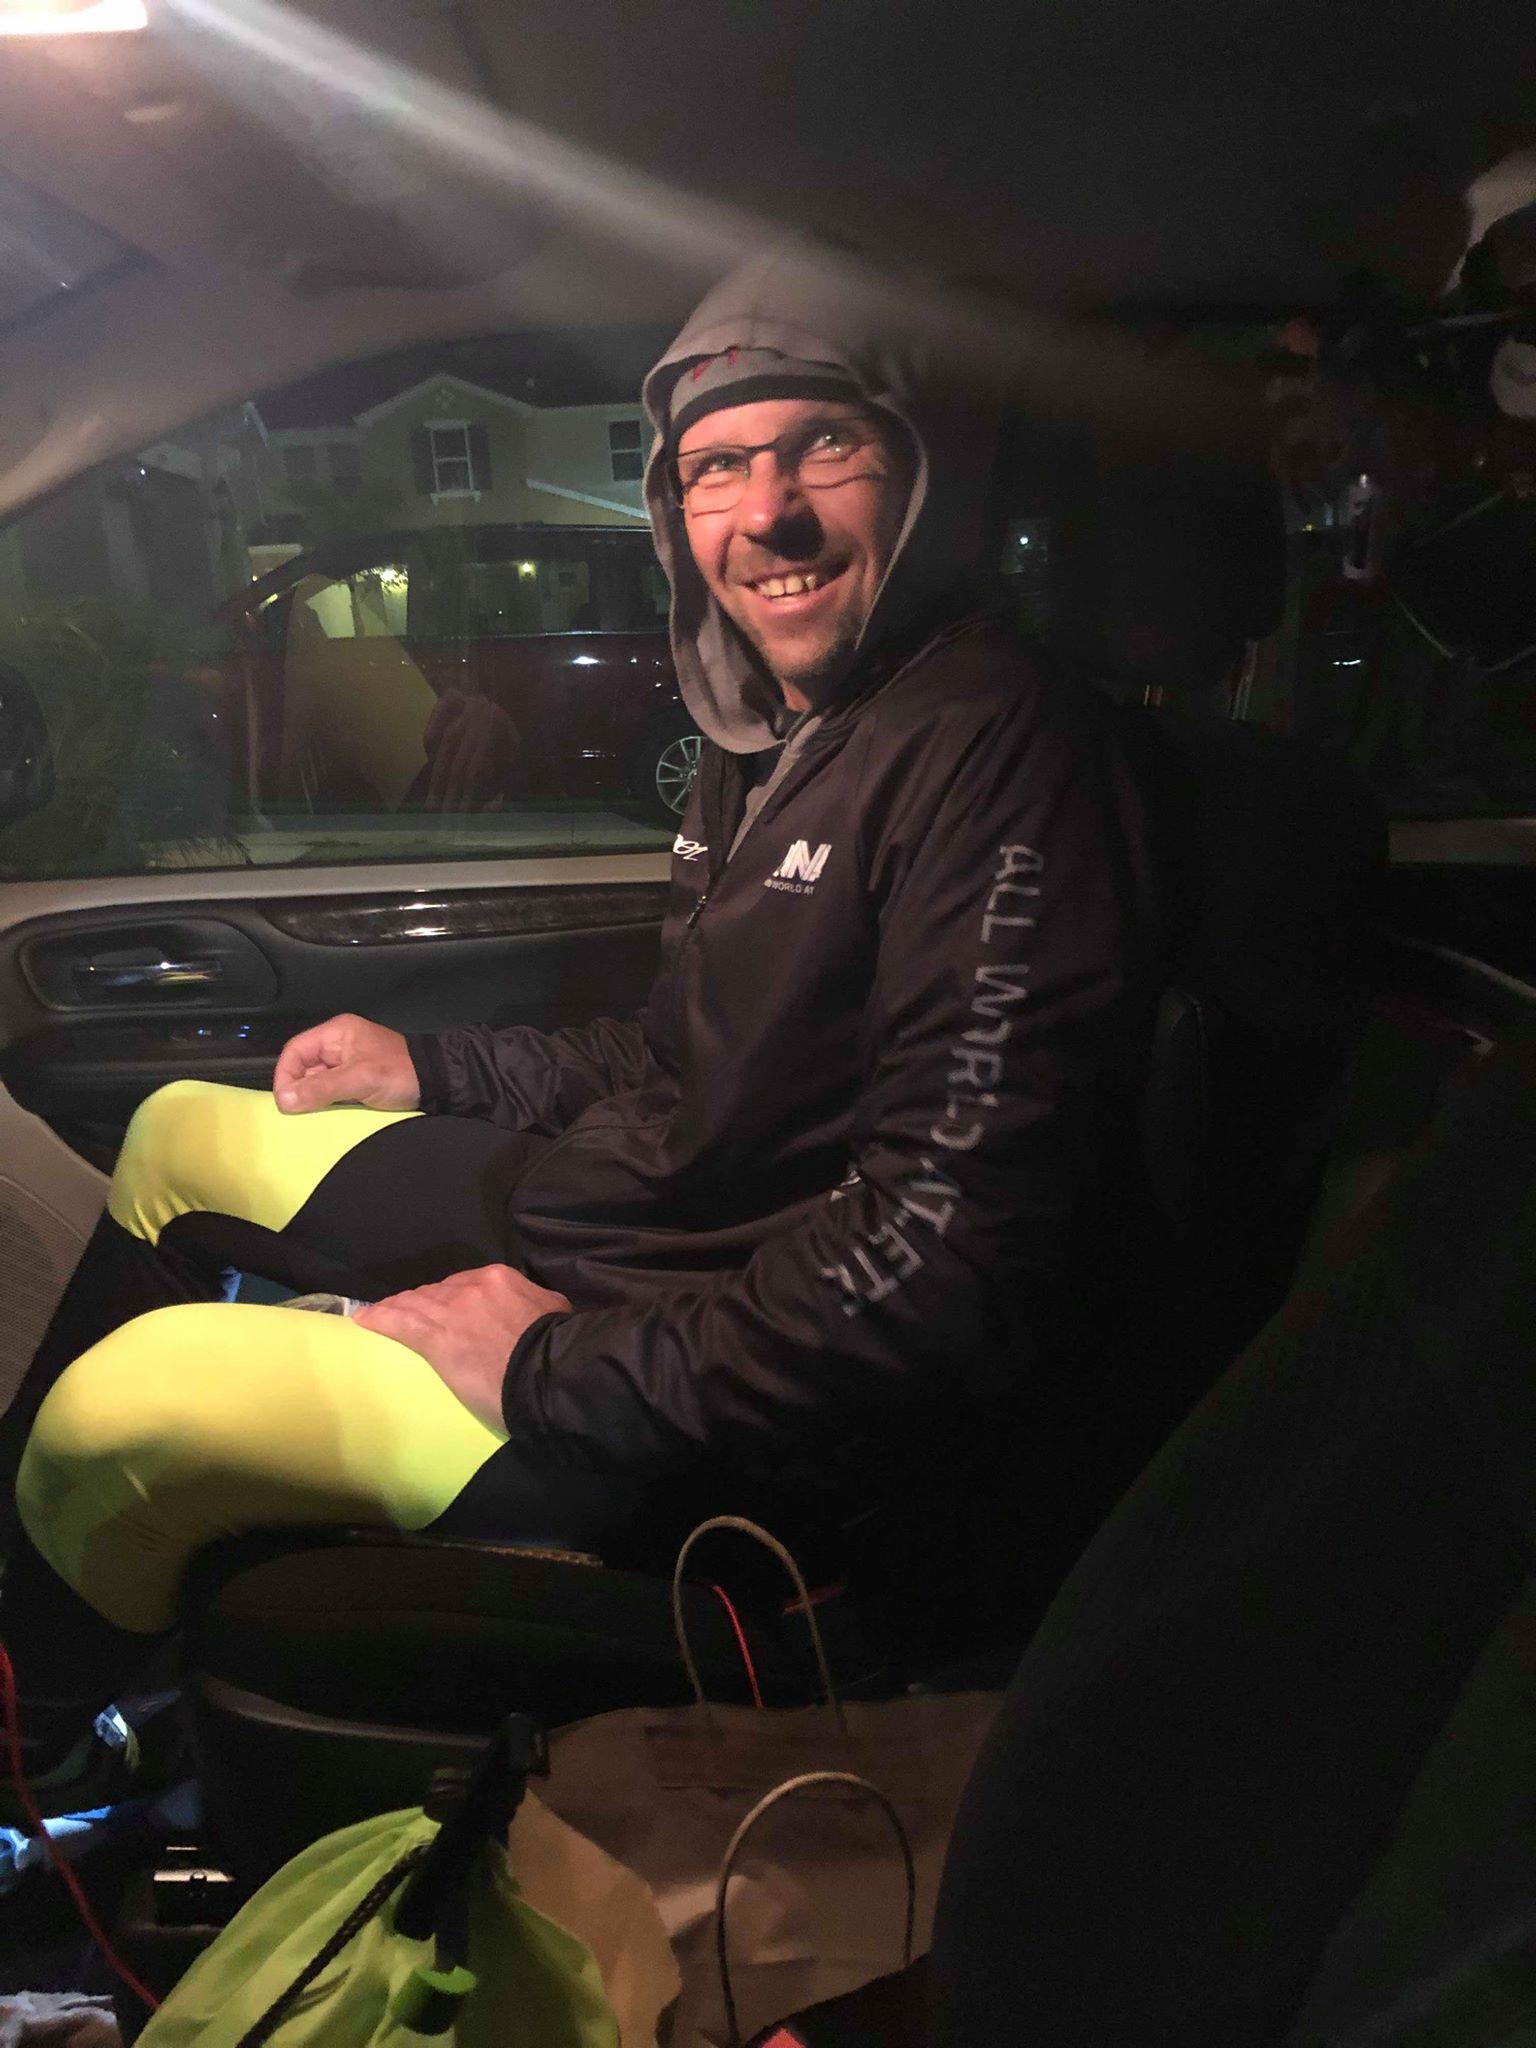 Coach_Terry_Wilson_Pursuit_of_The_Perfect_Race_Ultraman_Florida_Chris_Pollack_5.jpg